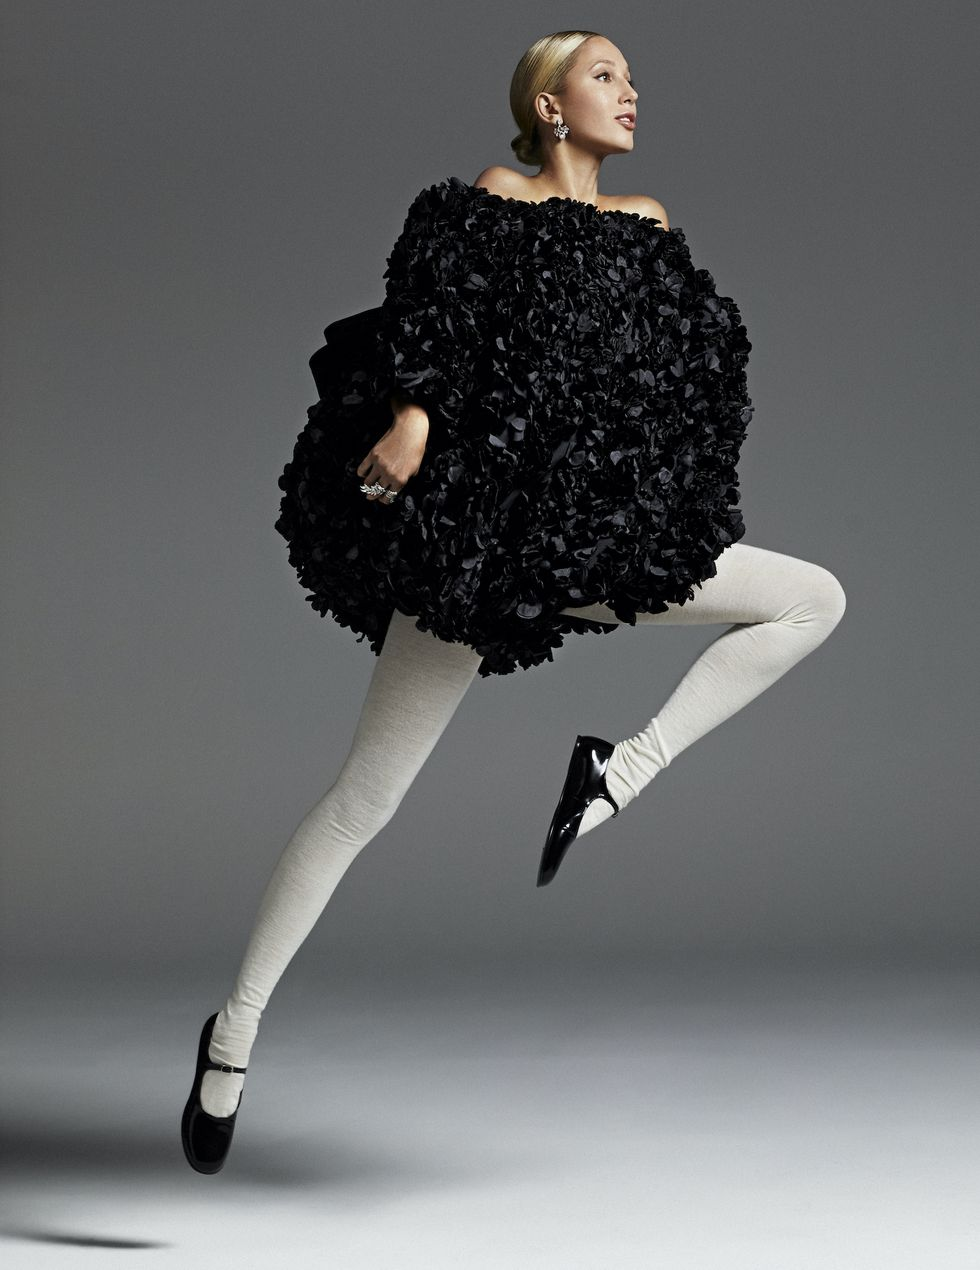 Мария-Олимпия снялась для испанского Harper's BAZAAR https://hips.hearstapps.com/hmg-prod.s3.amazonaws.com/images/2-200901-f05-1264-rgb-1602789587.jpg?resize=980:*